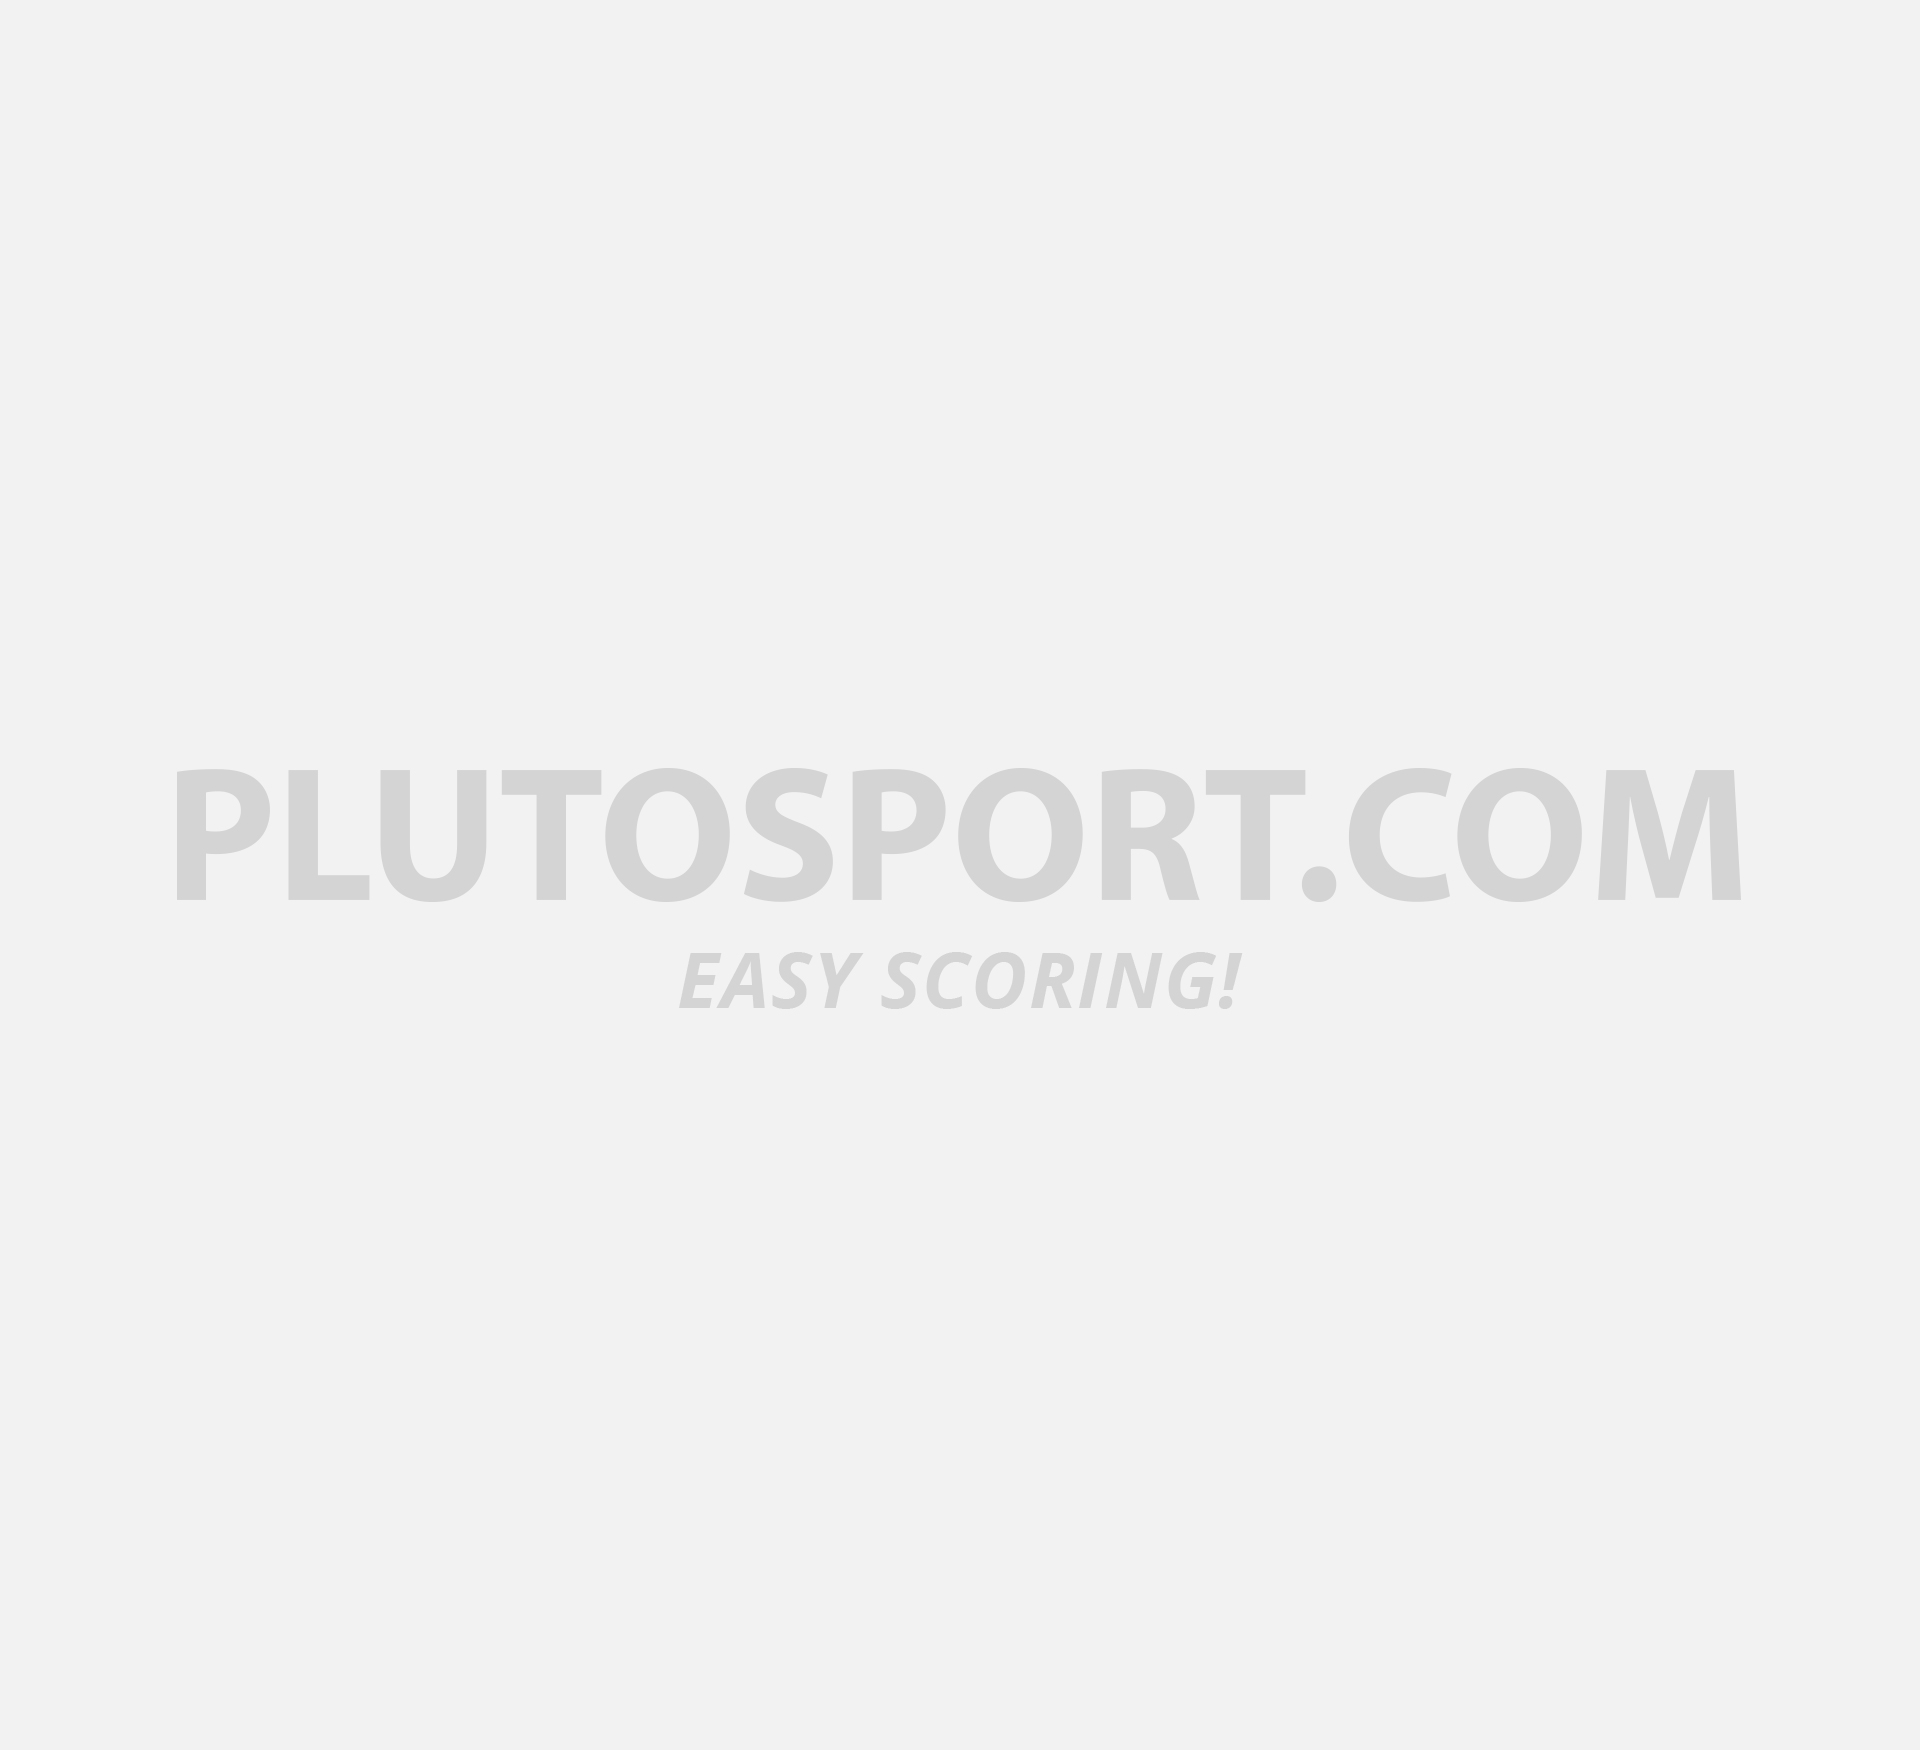 0173093a7b5 Adidas BB Trainingsjack - Sweatjackets - Sweaters - Clothing - Lifestyle -  Sports | Plutosport